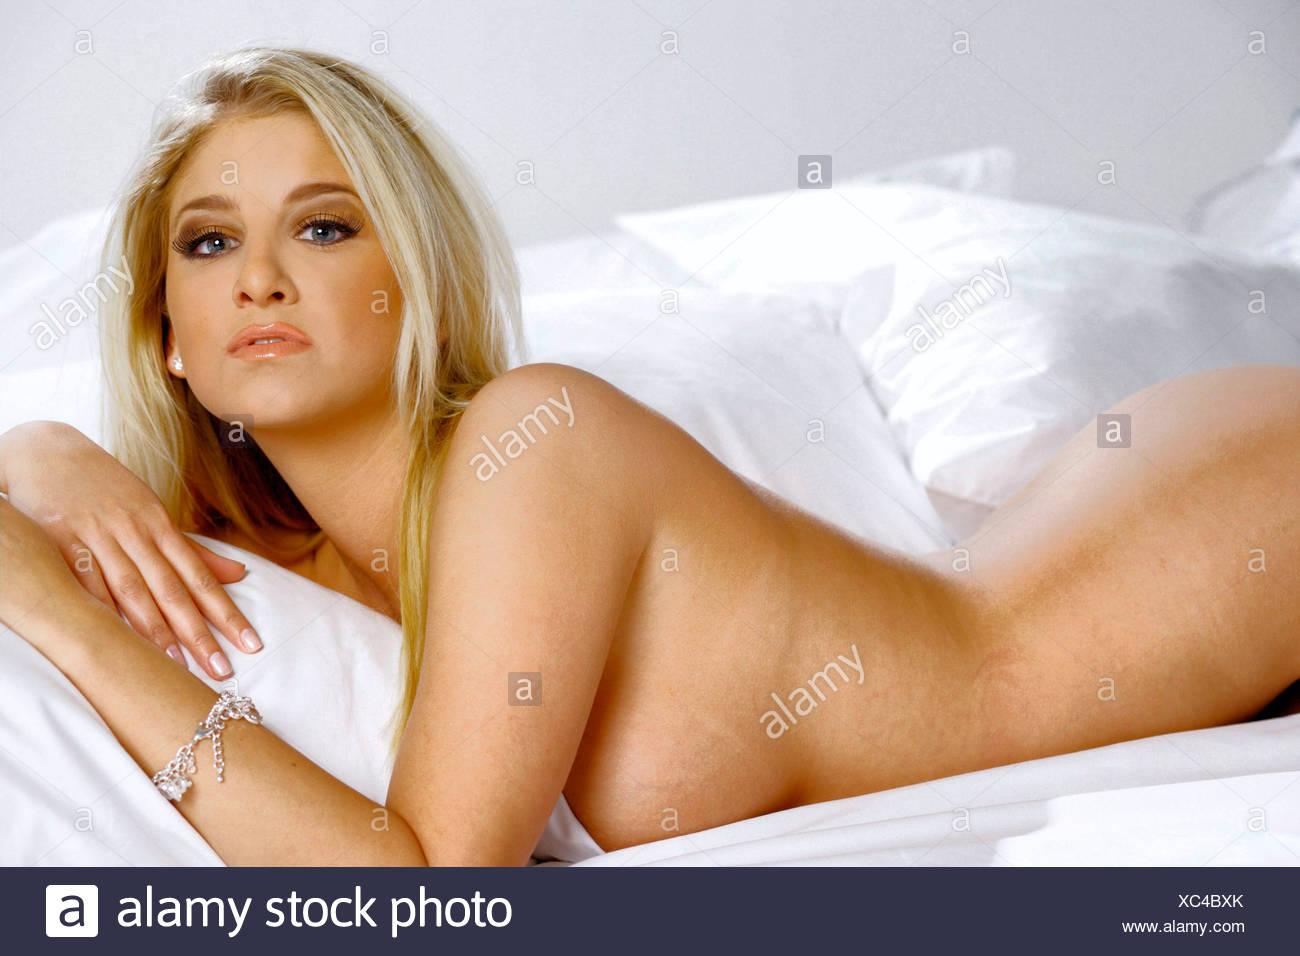 ariana grande nackt im bett